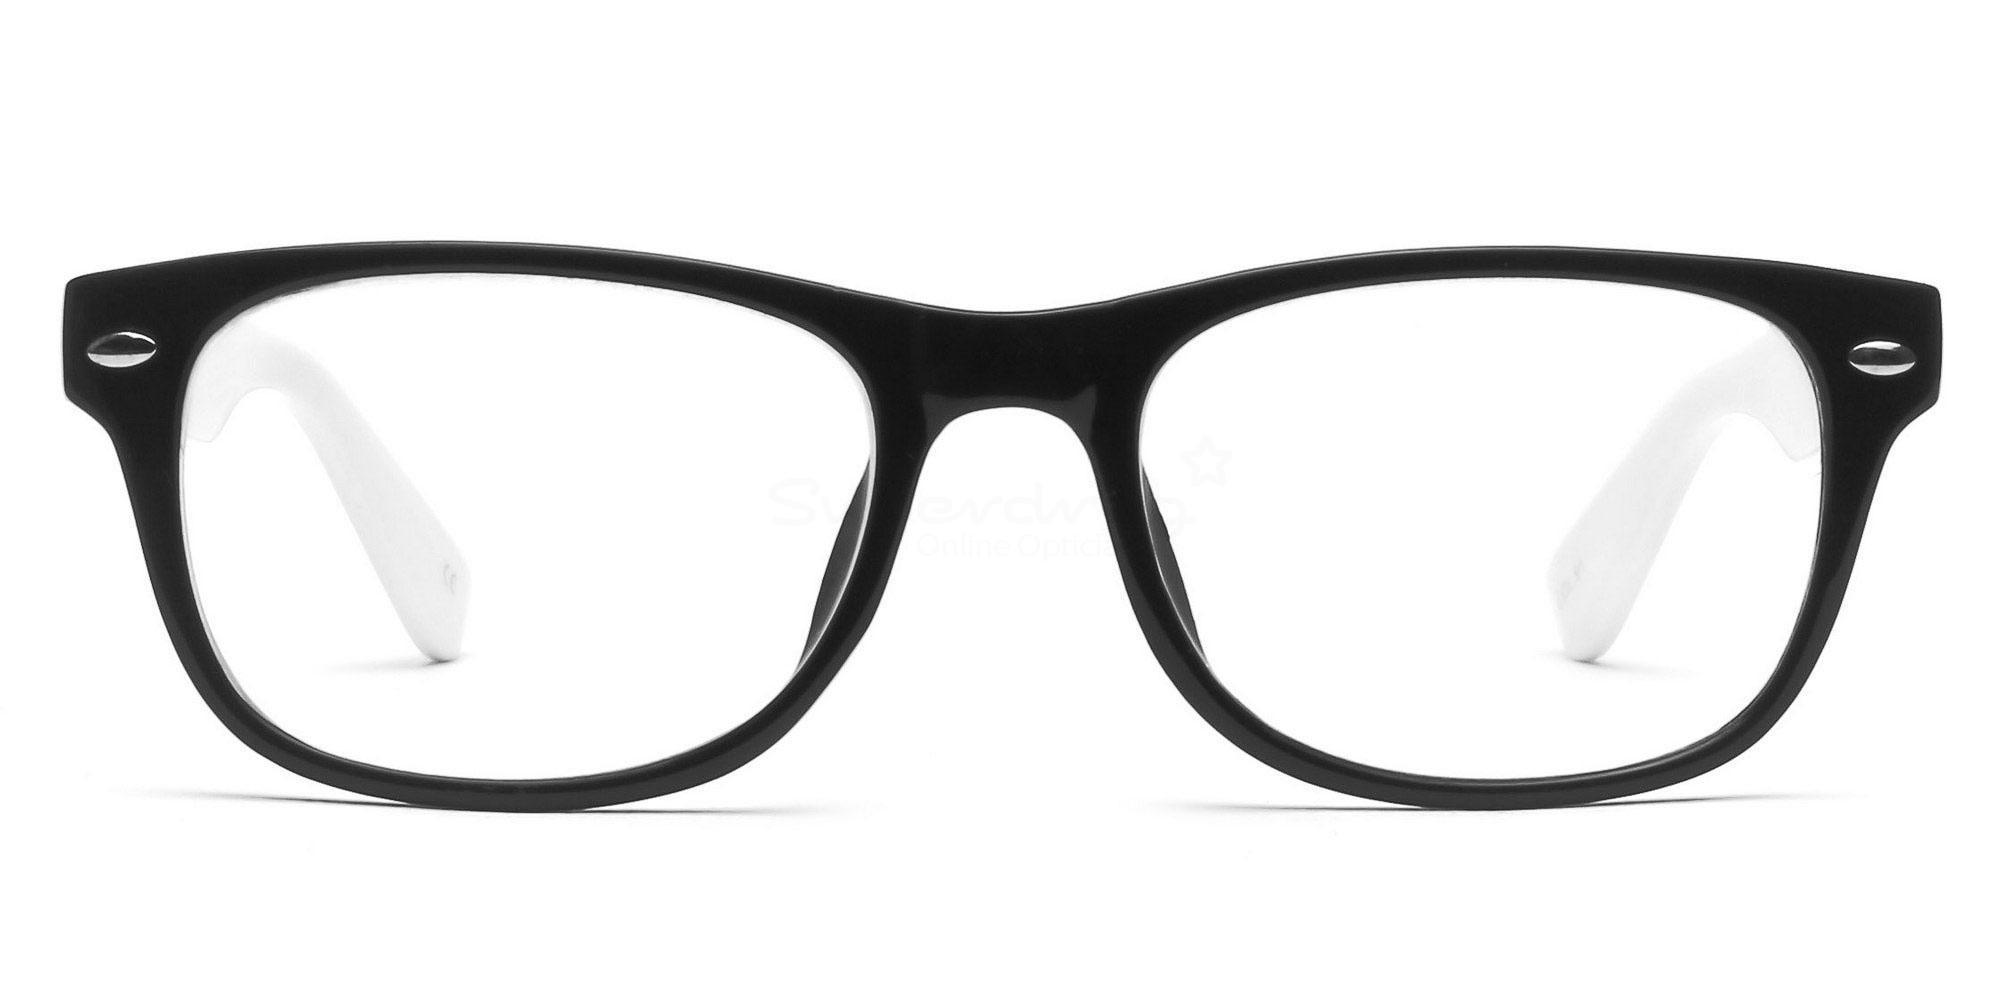 Black and White P2383 - Black and White Glasses, Helium